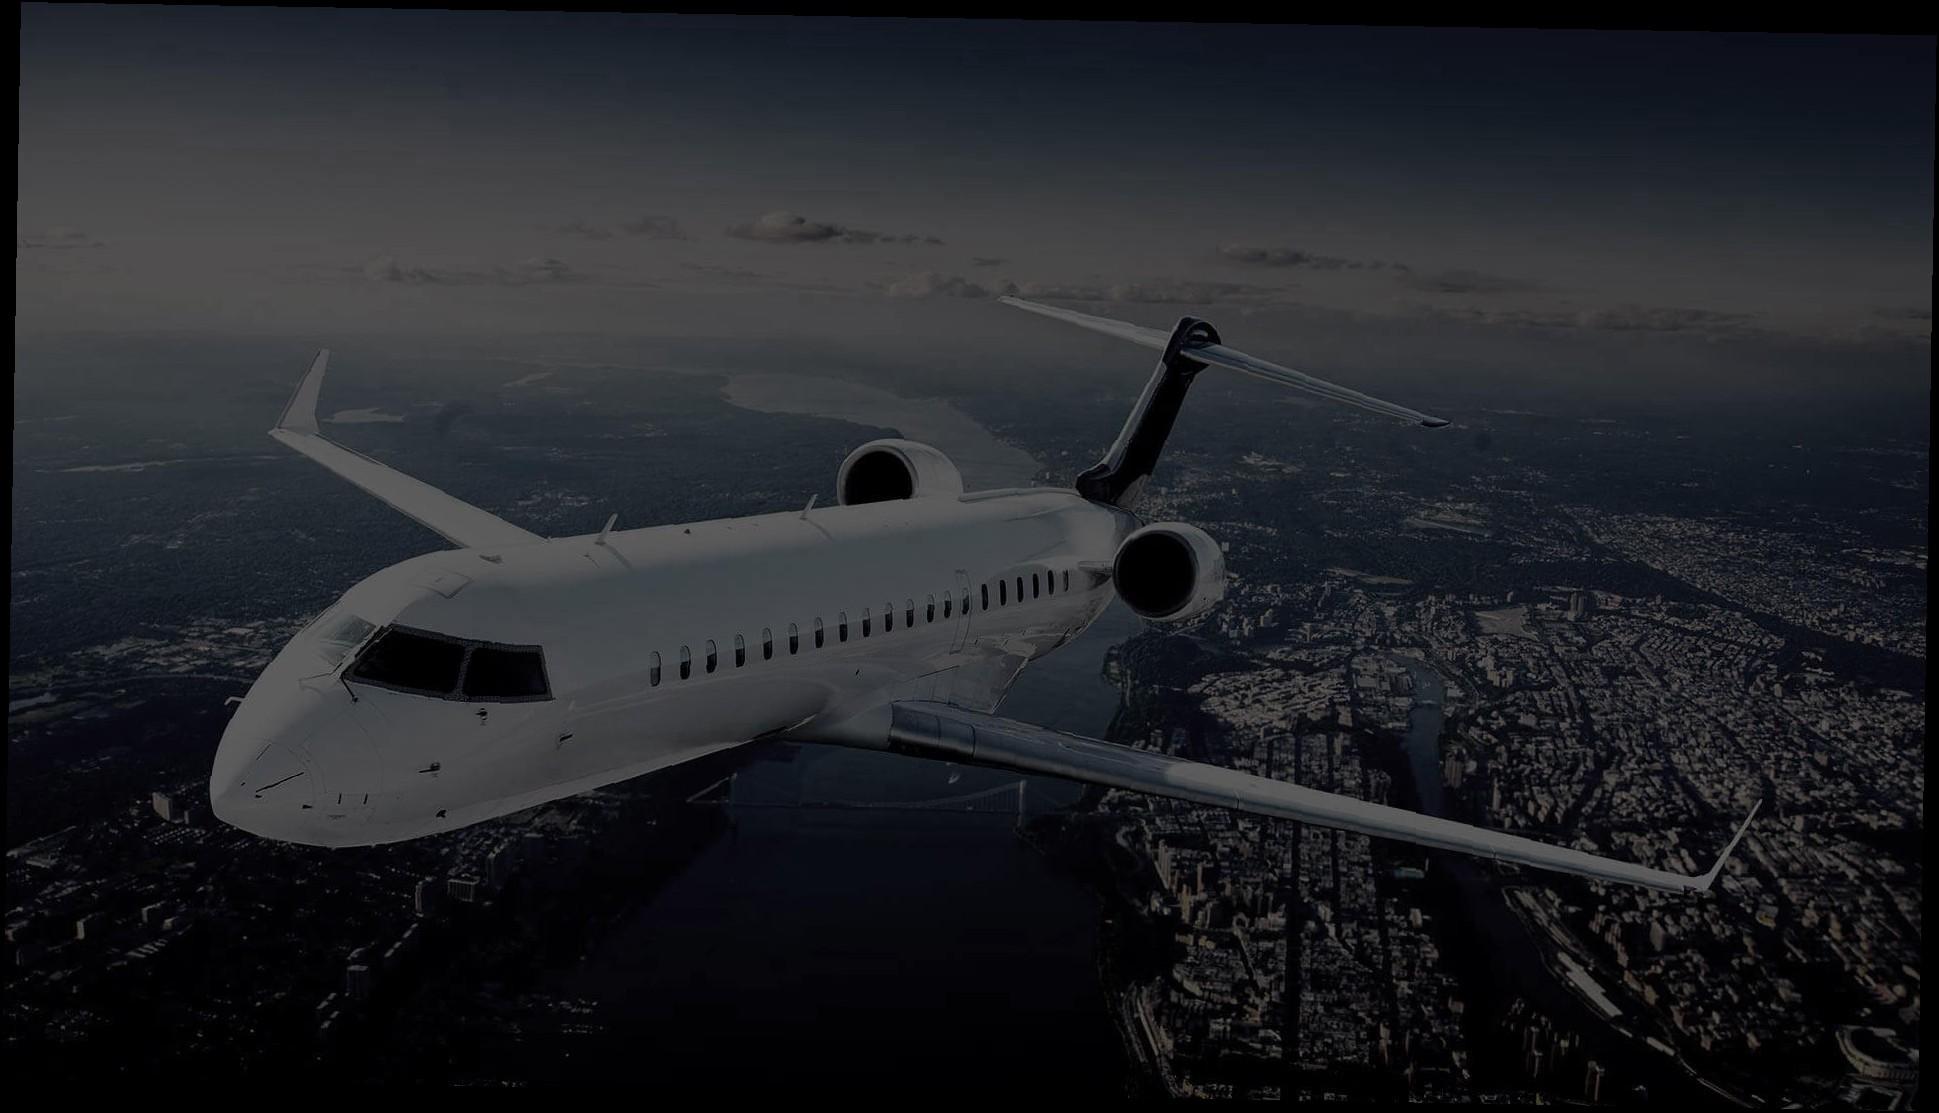 Король Абдул-Азиз код IATA: JED ICAO: OEJN Джедда Саудовская Аравия